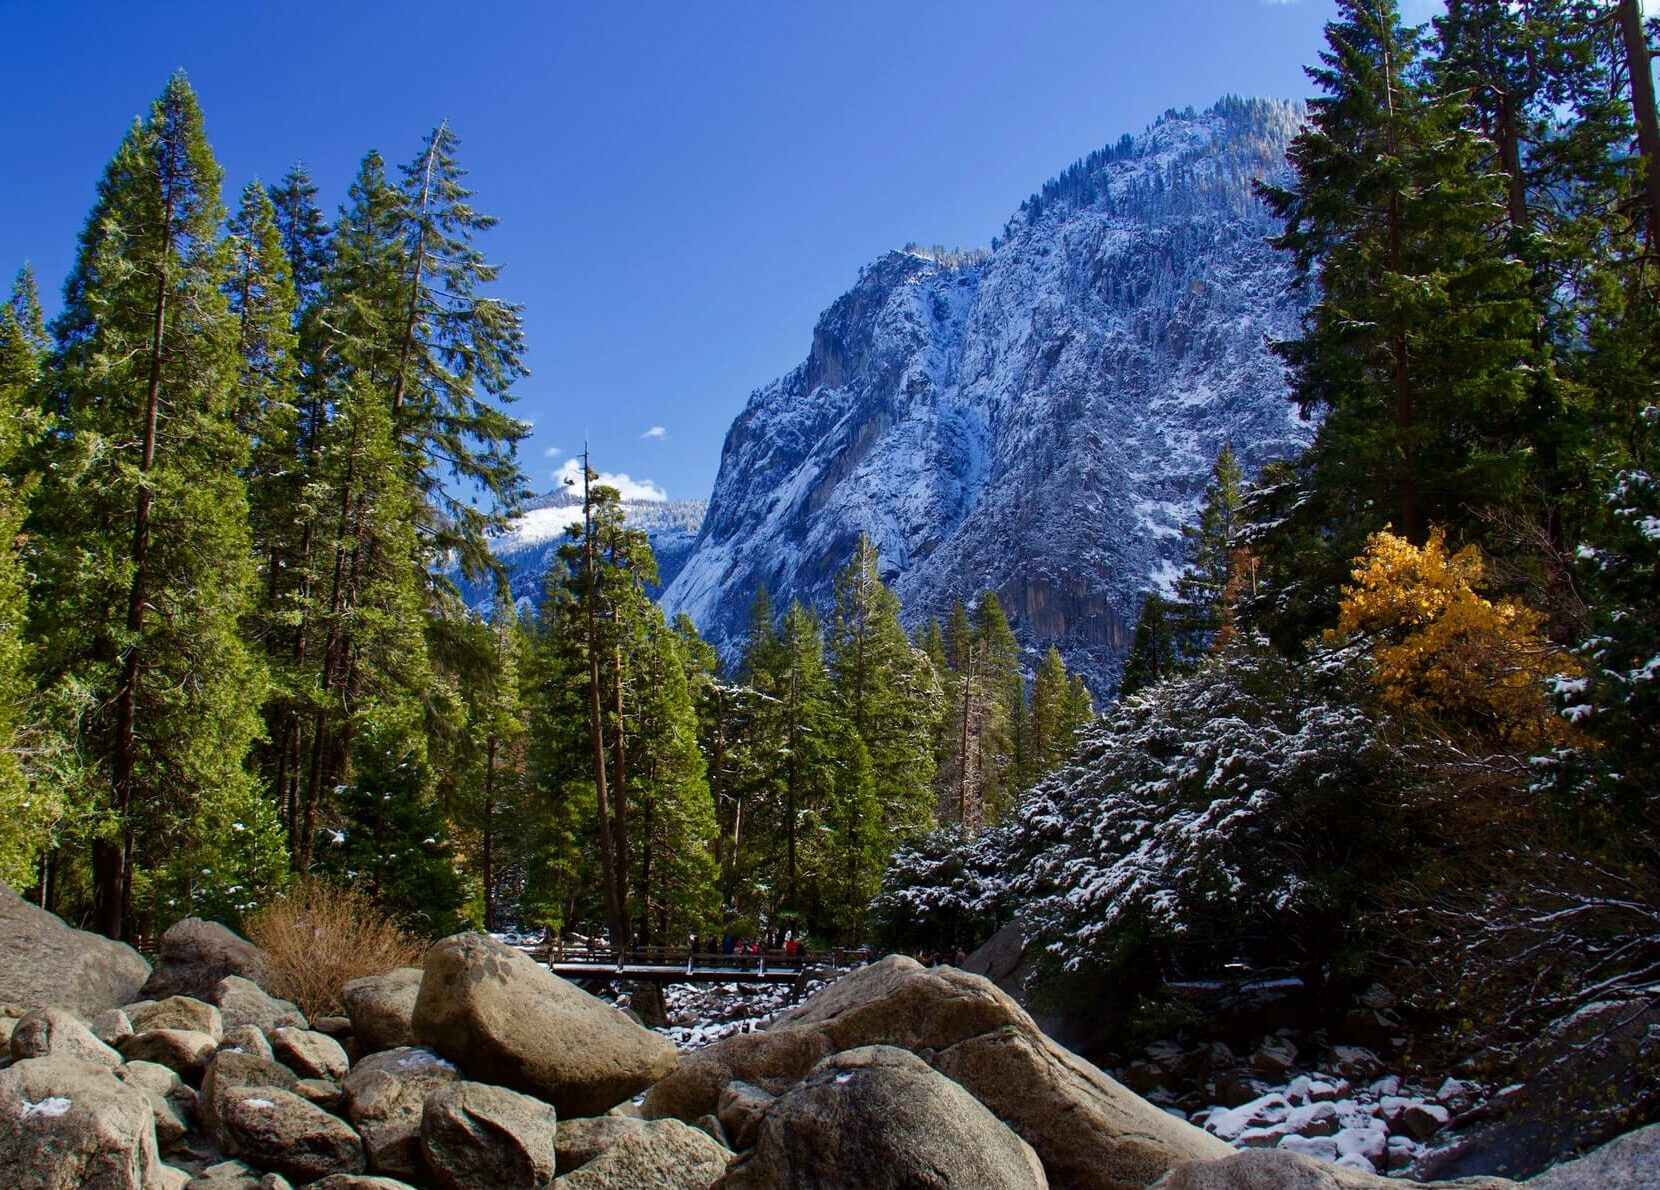 plant life of Yosemite National Park